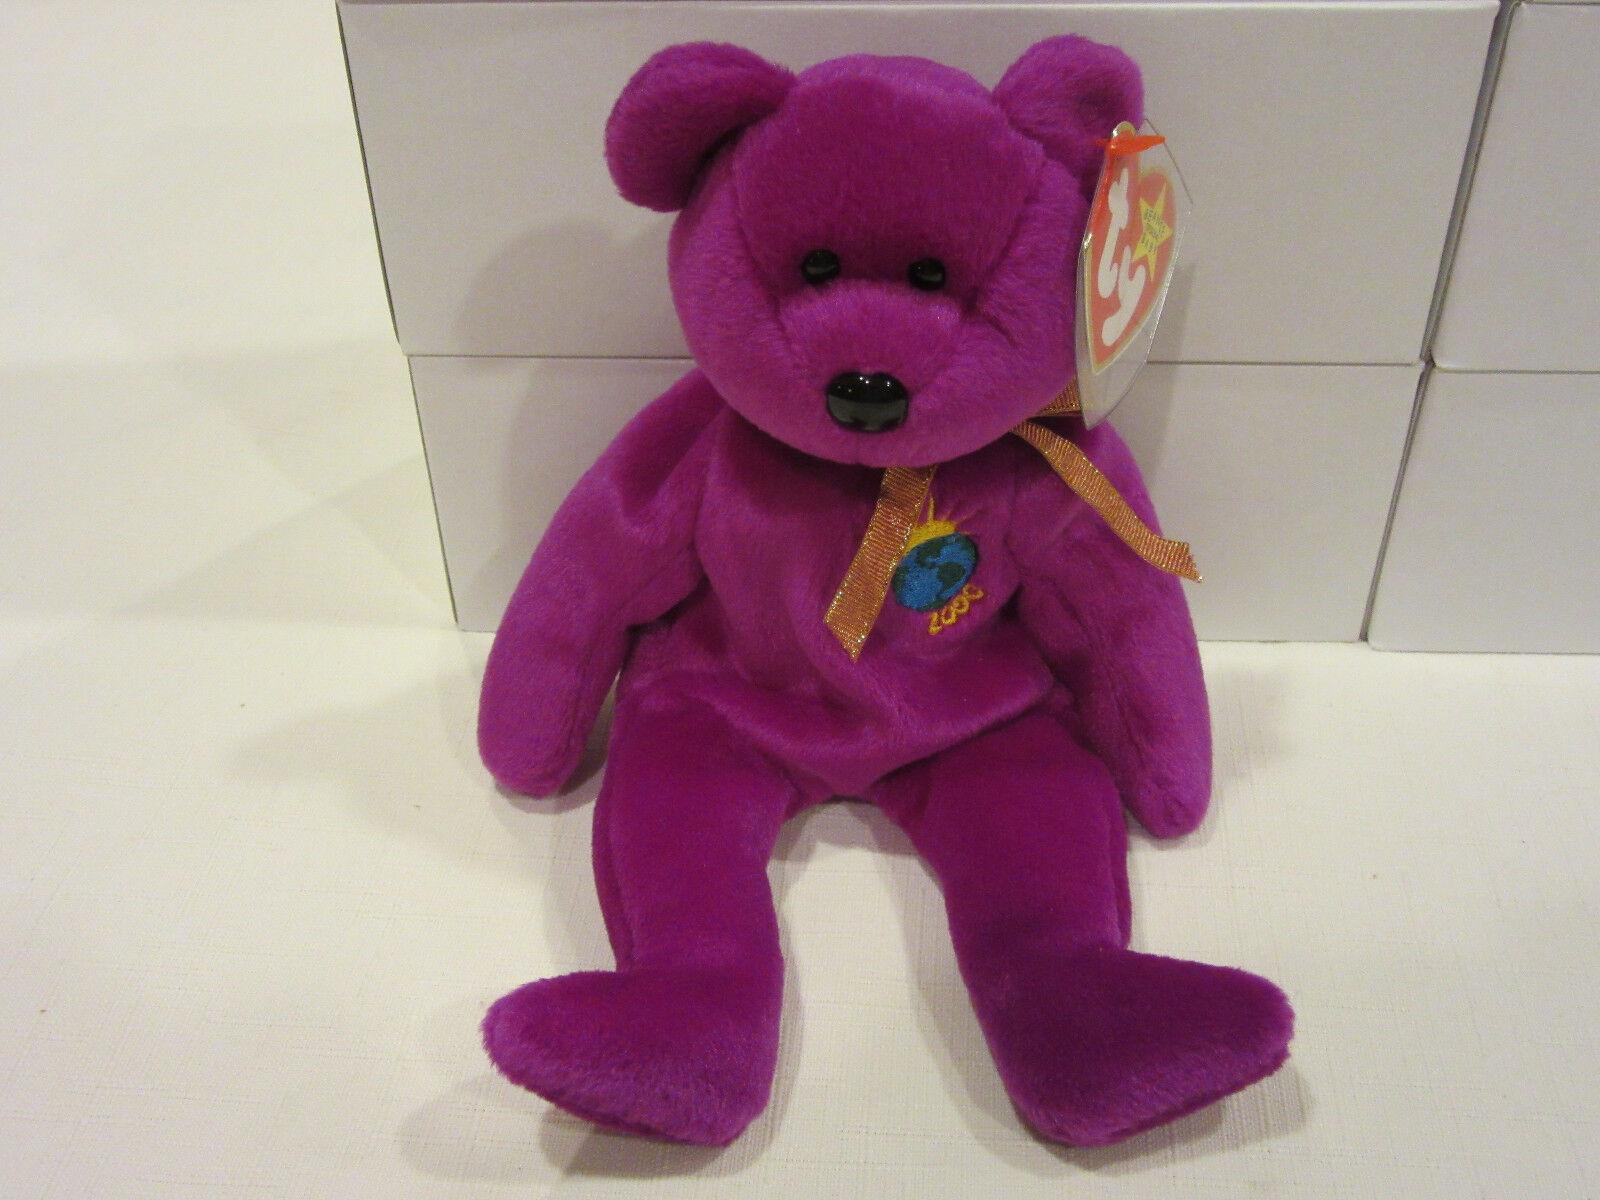 2000 Millennium TY Bear Magenta Limited Edition Beanie Baby